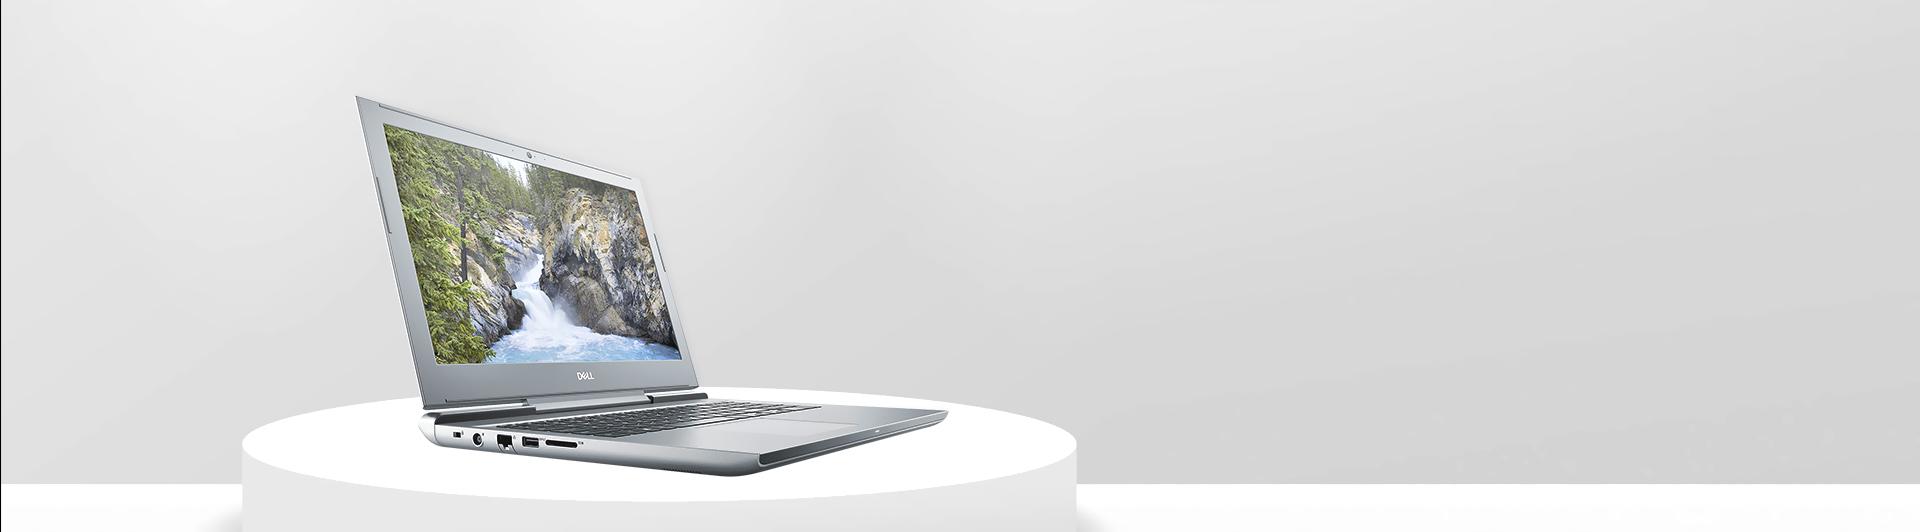 Laptop Dell Vostro 7570 - 70138566 cạnh phải